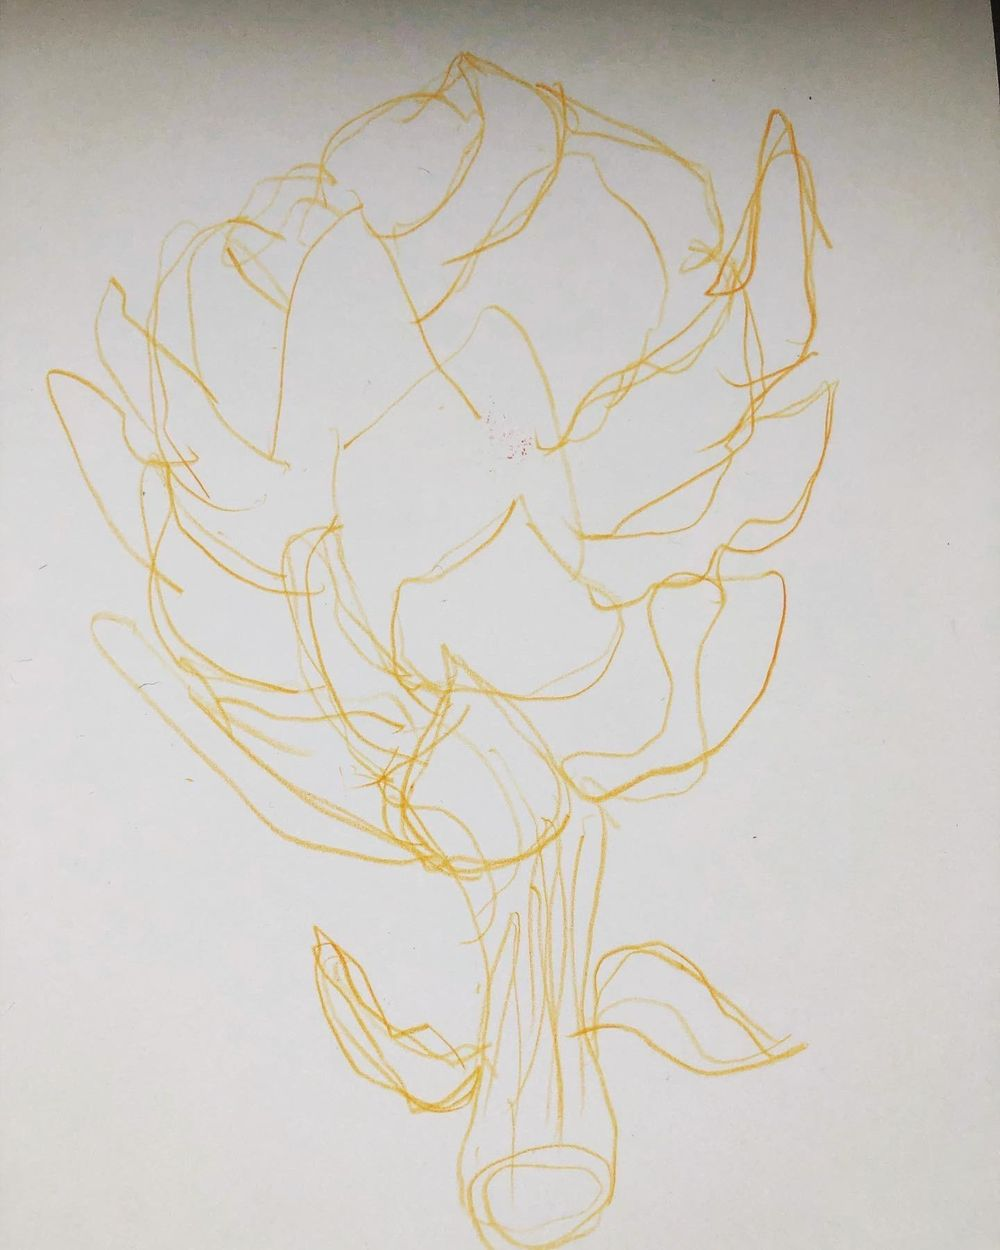 Exploration - artichoke drawings - image 2 - student project